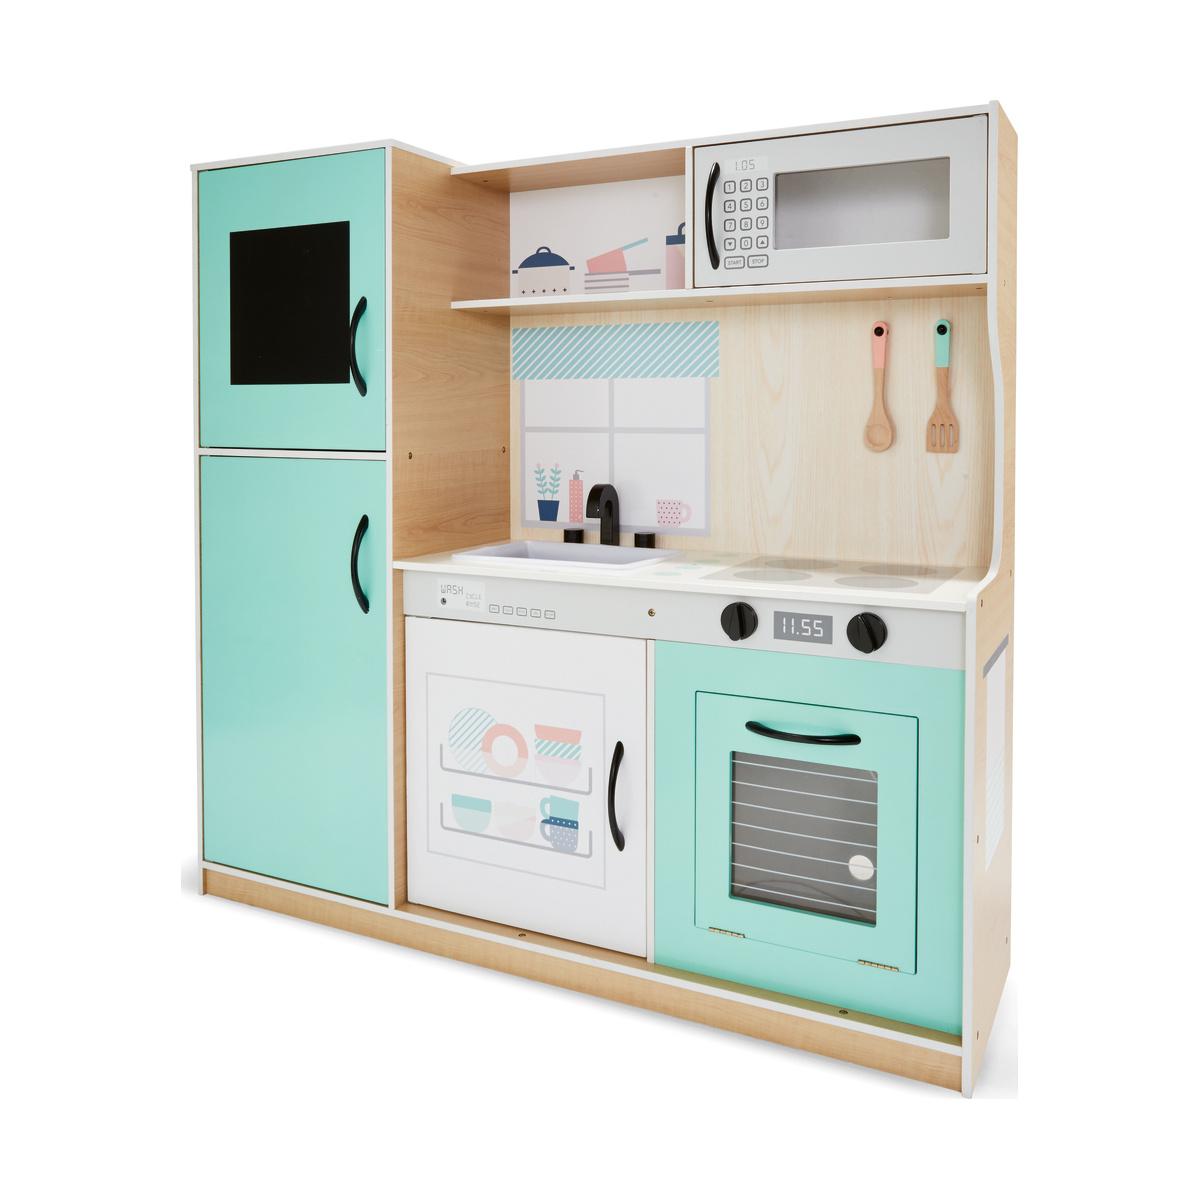 Large Wooden Kitchen Playset | Kmart